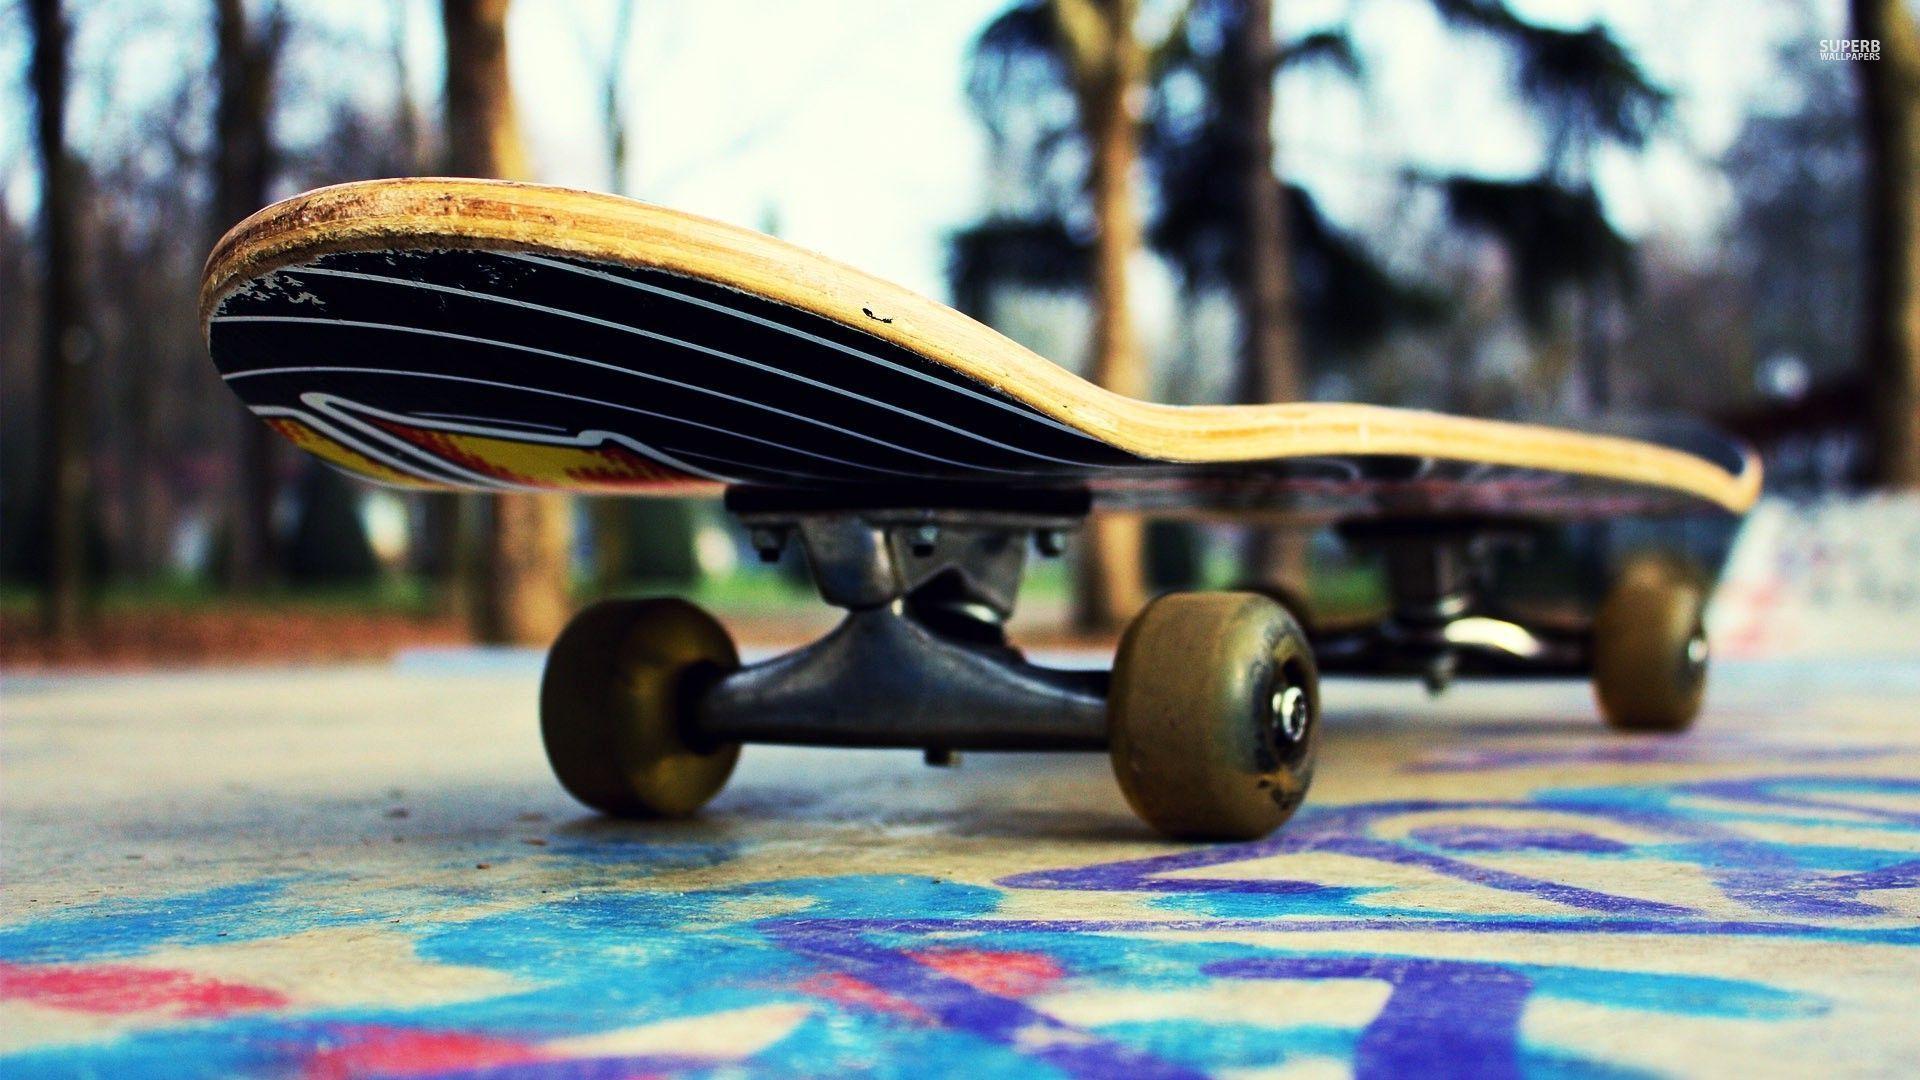 Girl Skateboards Wallpaper Hd Wallpaper Skate Hd Gratuit 224 T 233 L 233 Charger Sur Ngn Mag